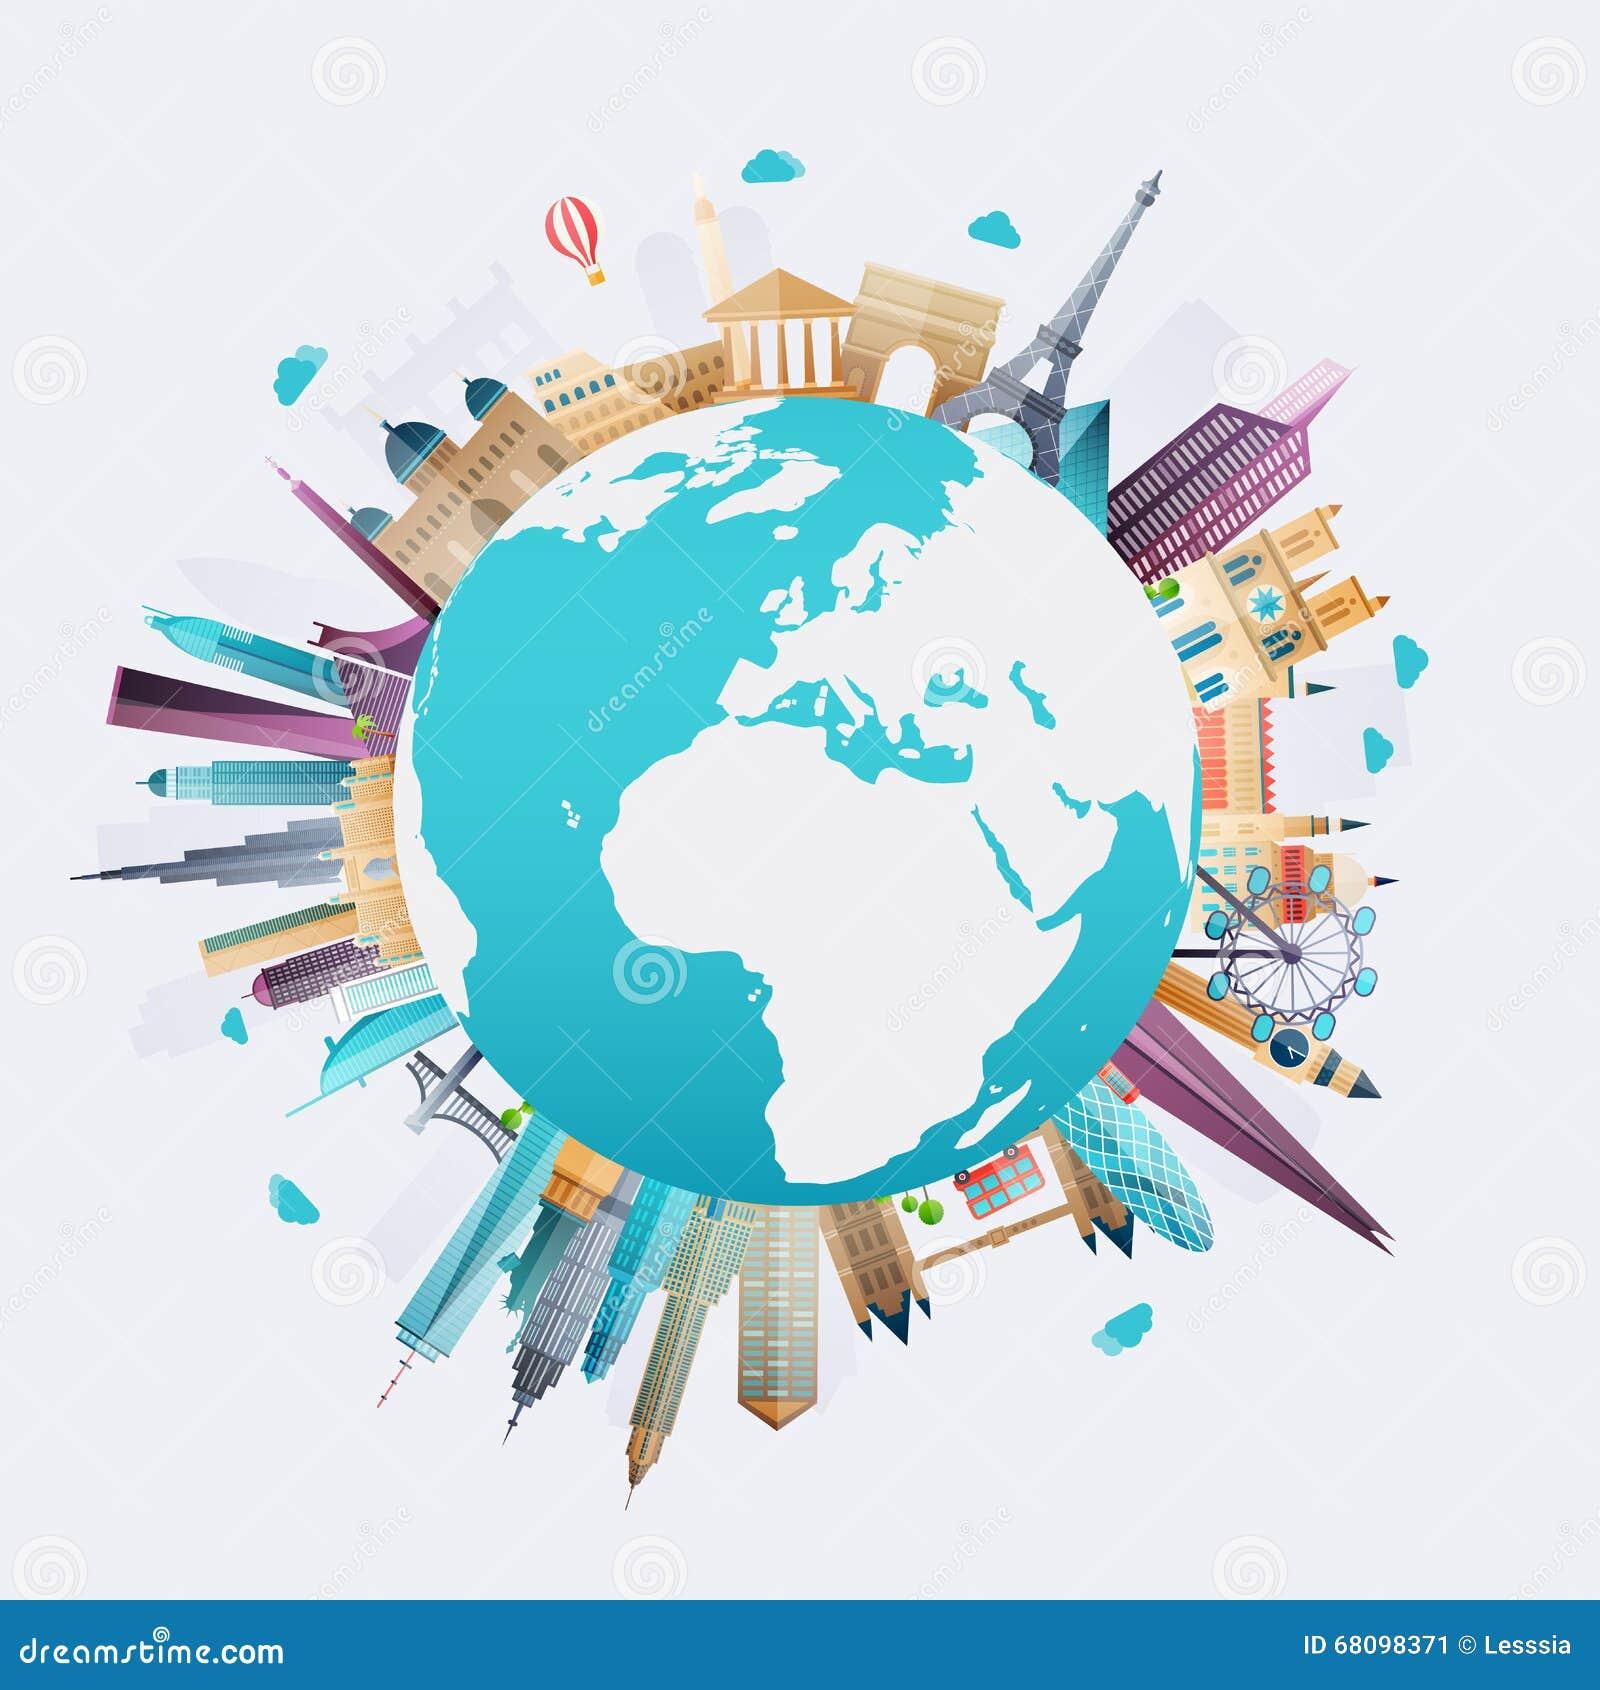 planet earth travel the world stock vector illustration